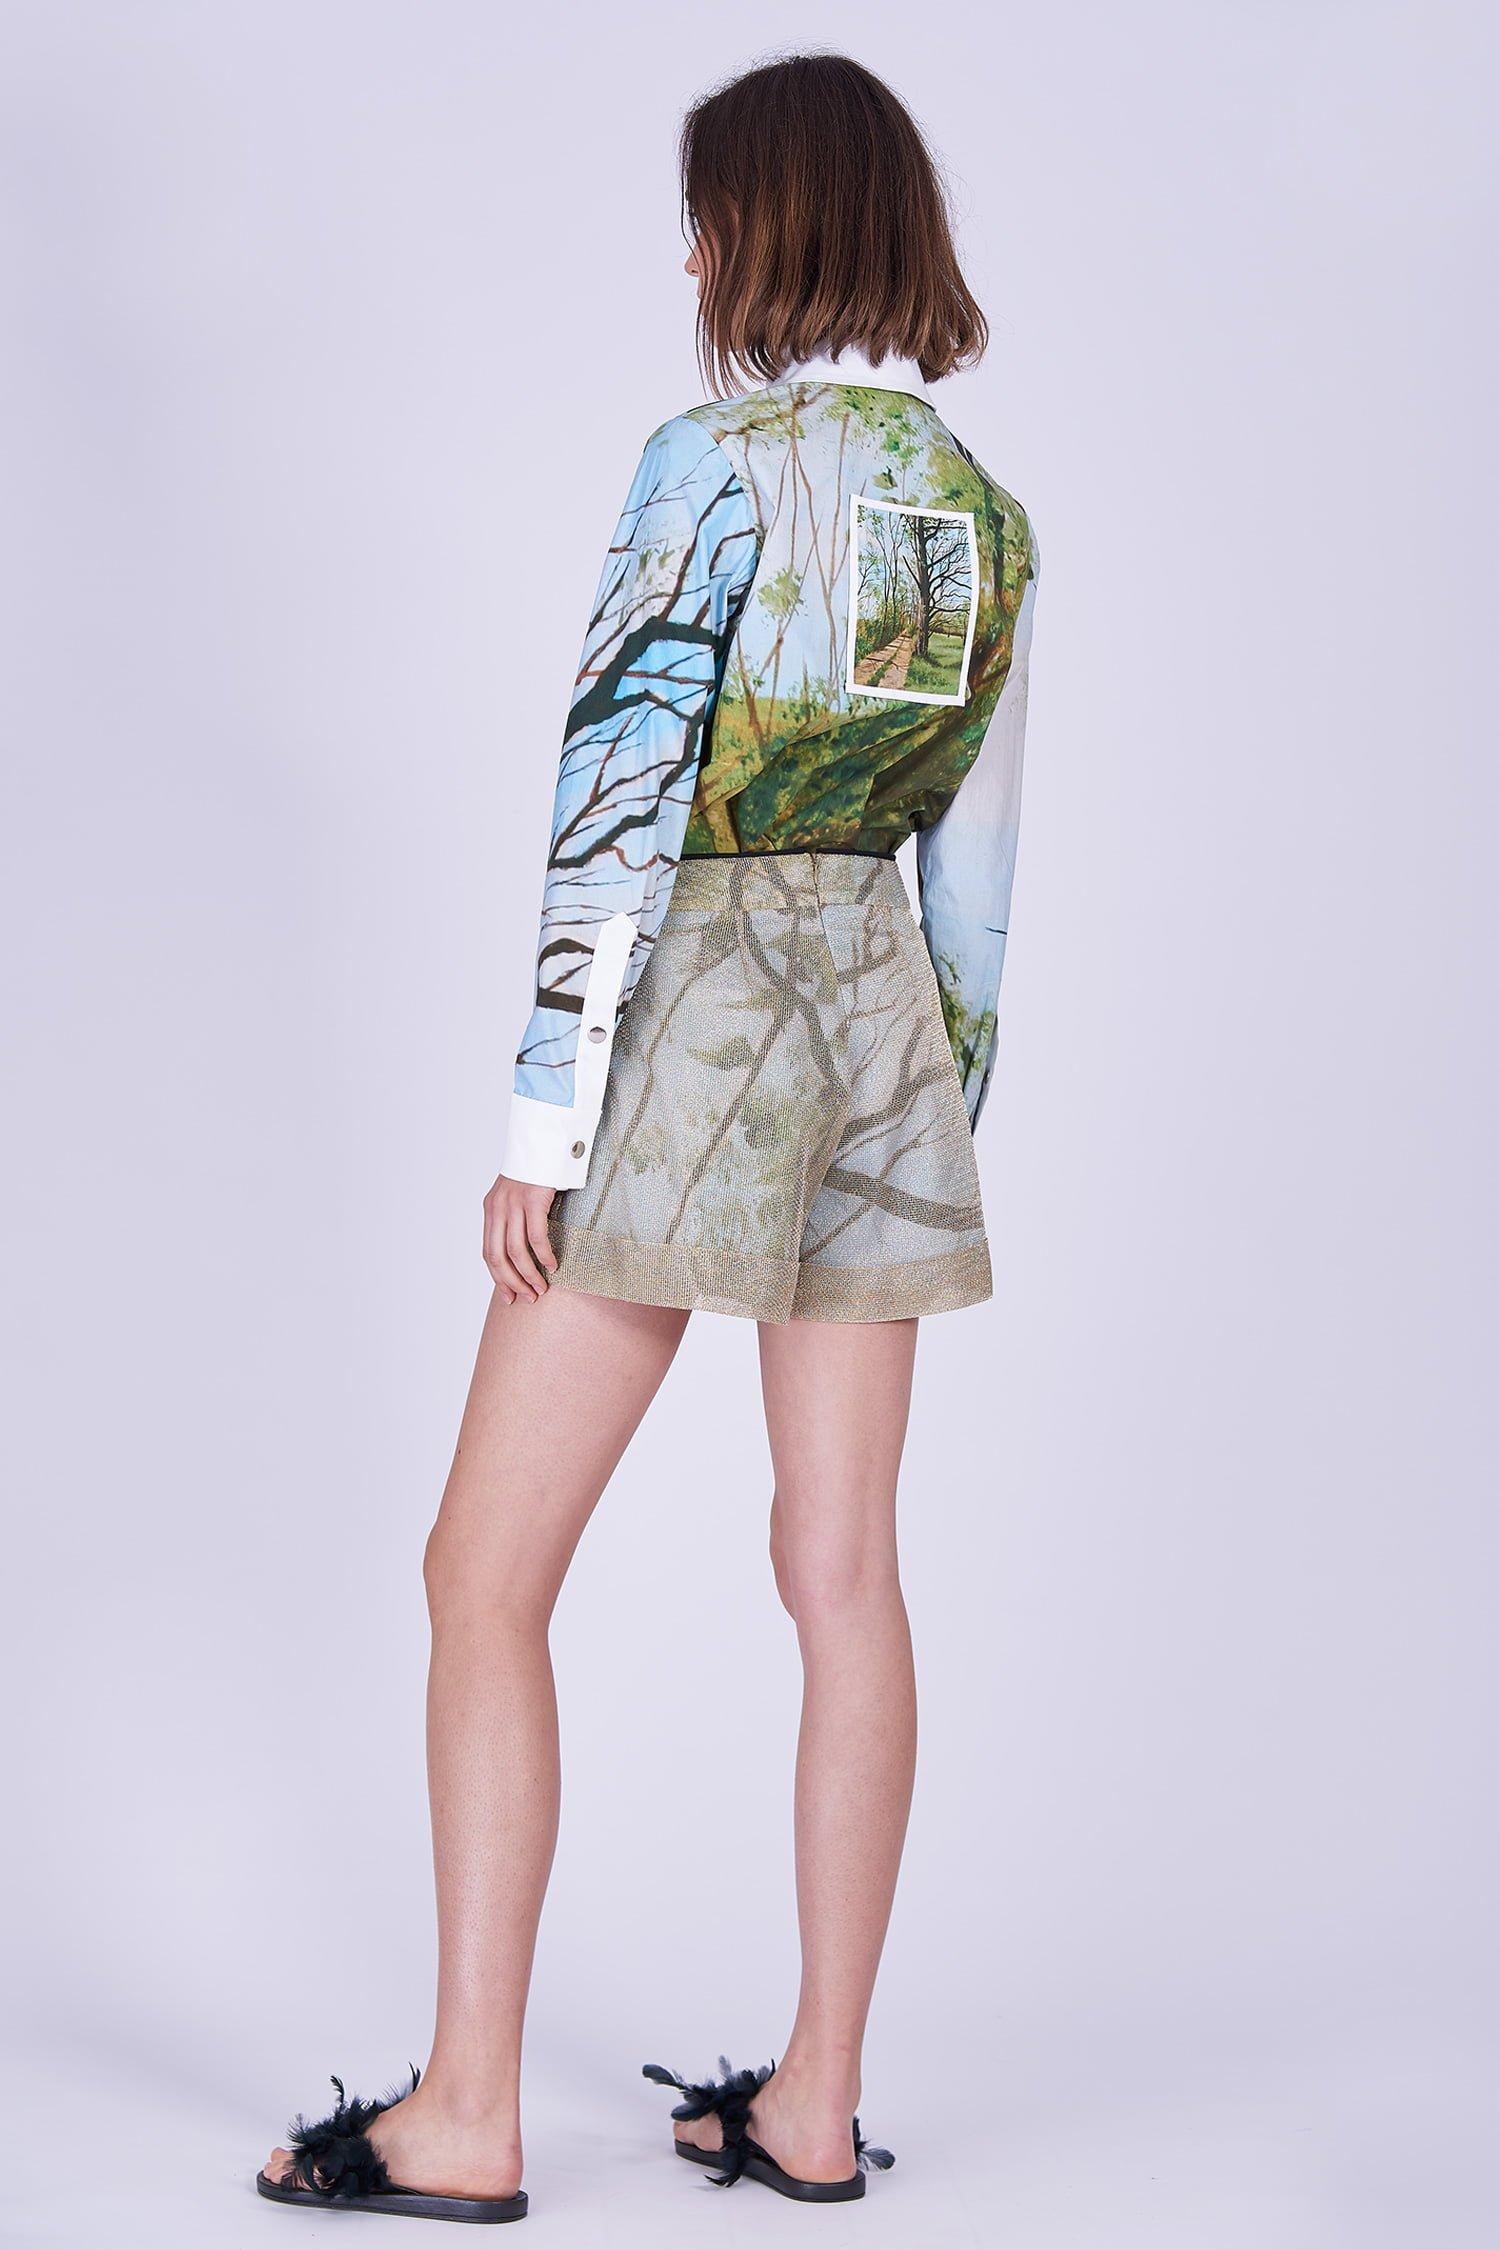 Acephala Ss2020 Printed Shirt Forest Golden Shorts Koszula Nadruk Las Zlote Szorty Back Side